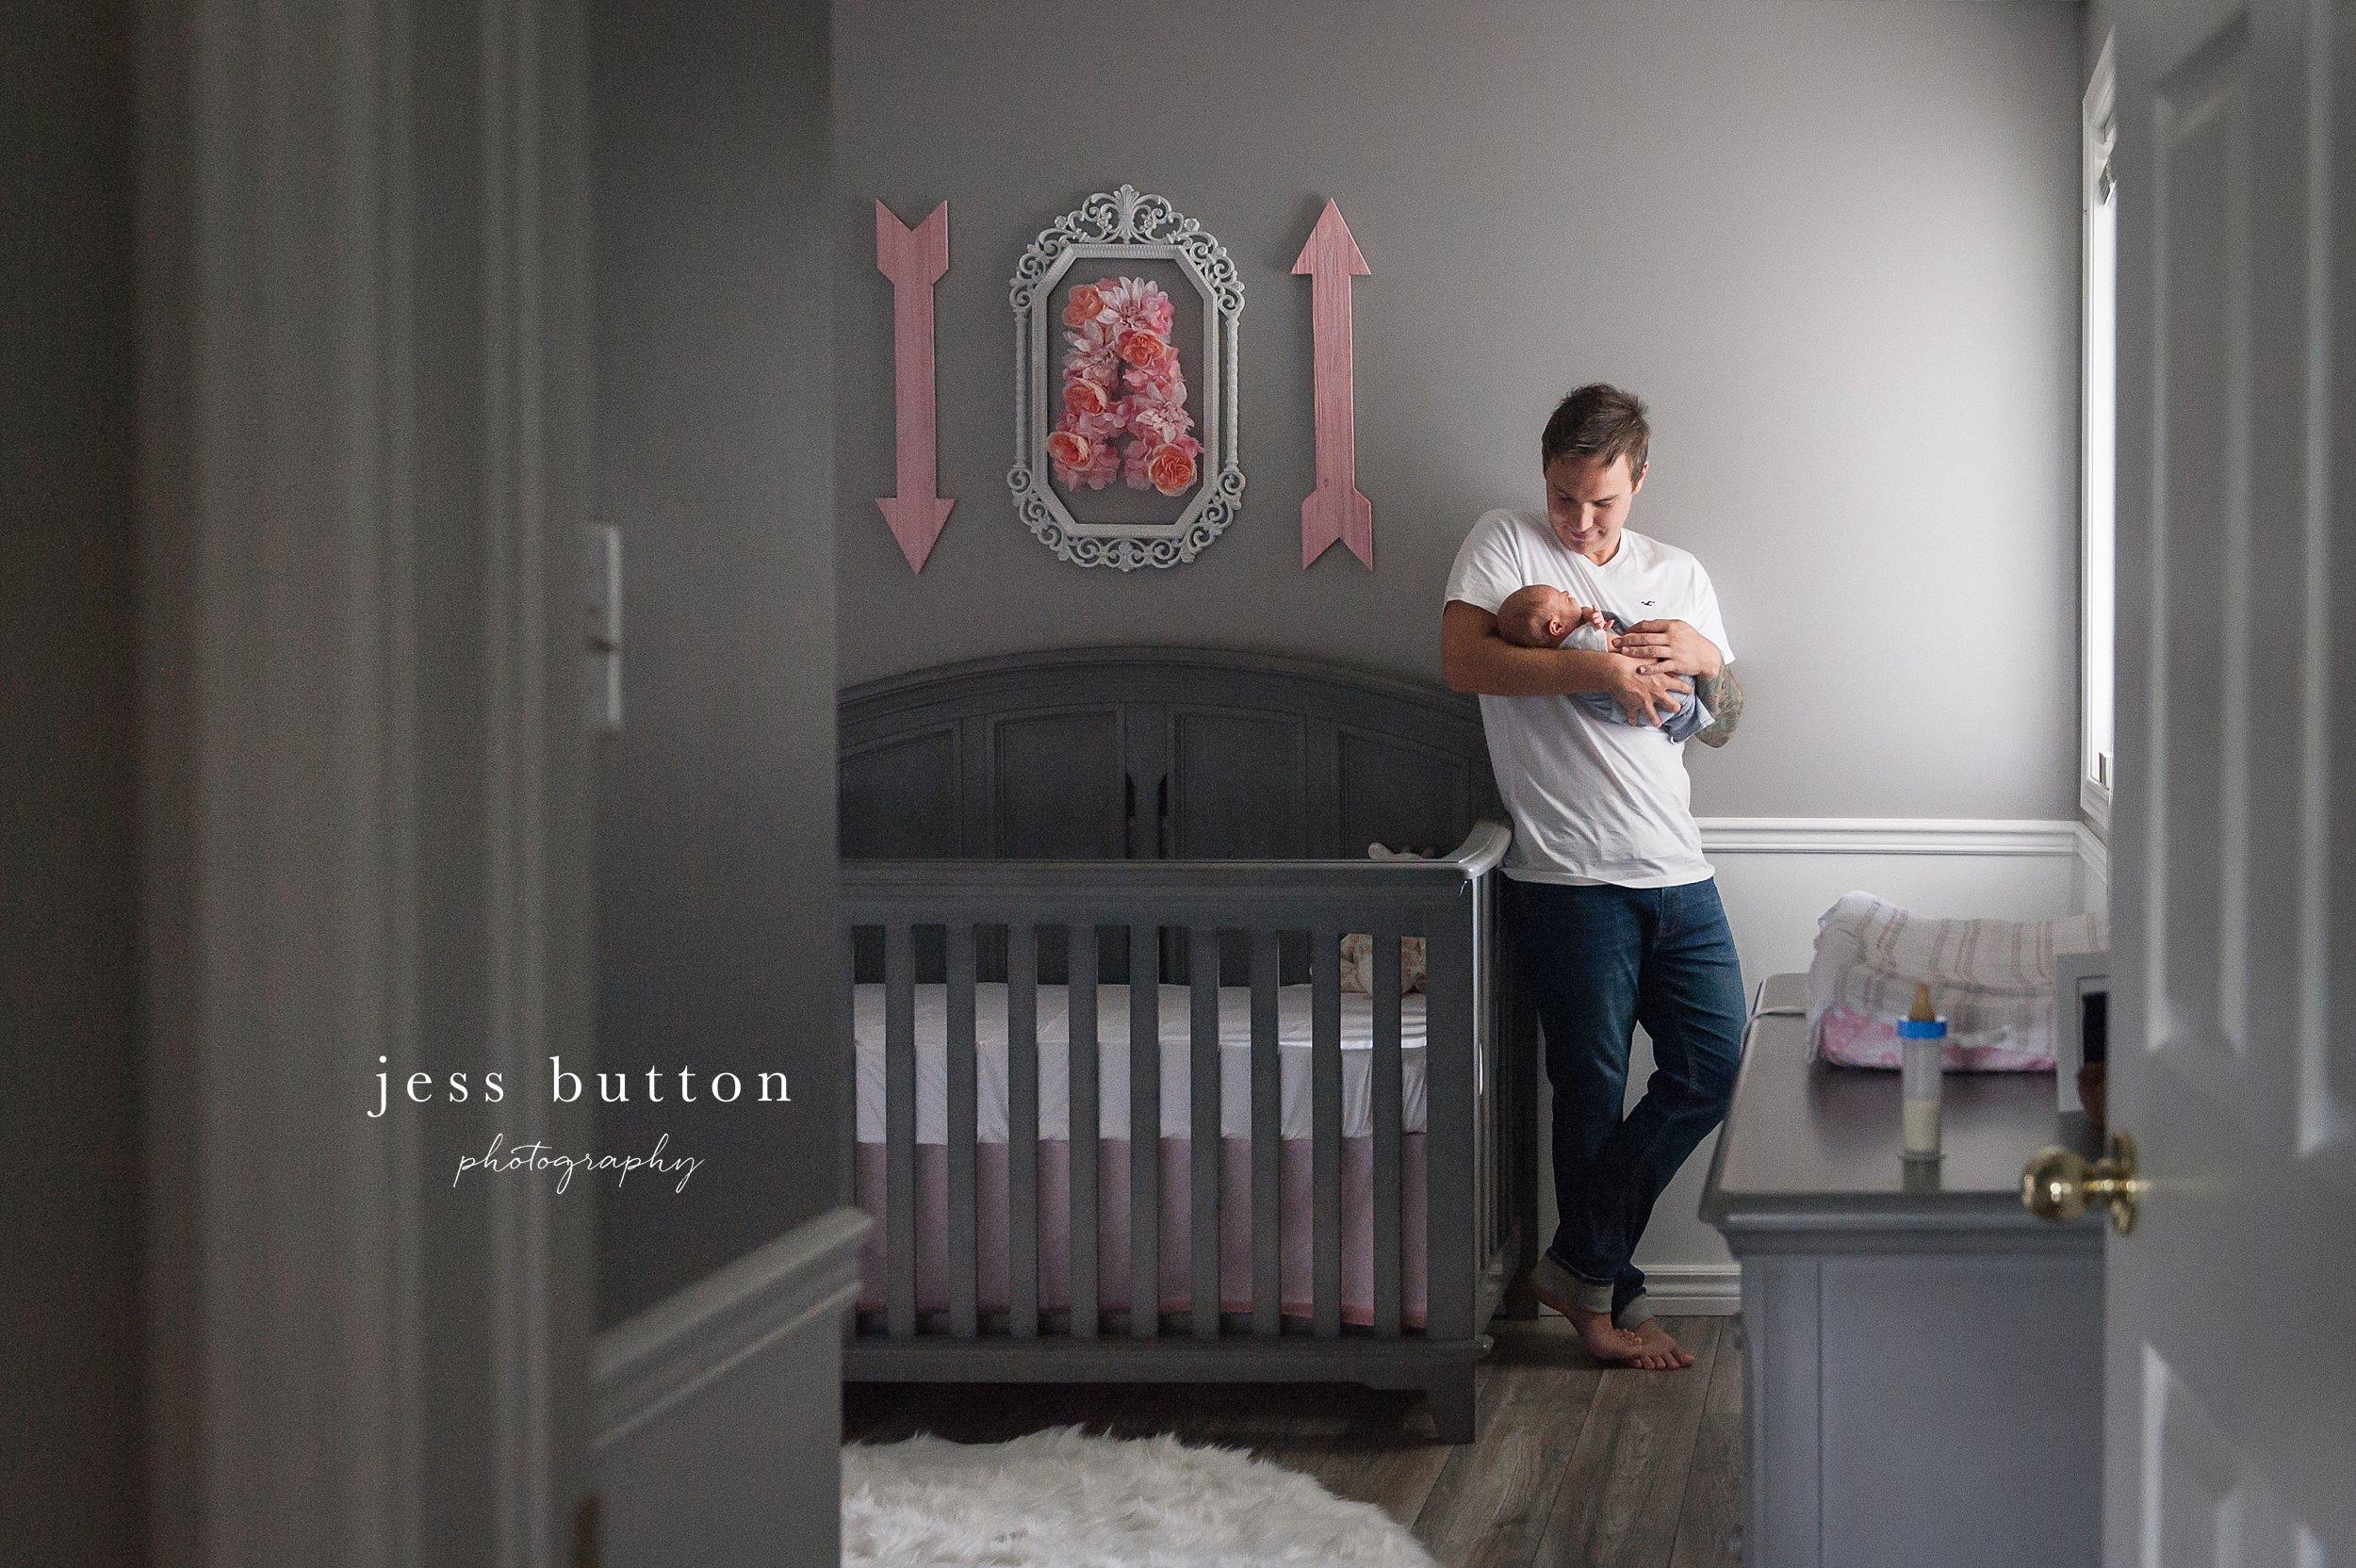 new dad holding newborn girl in nursery by window